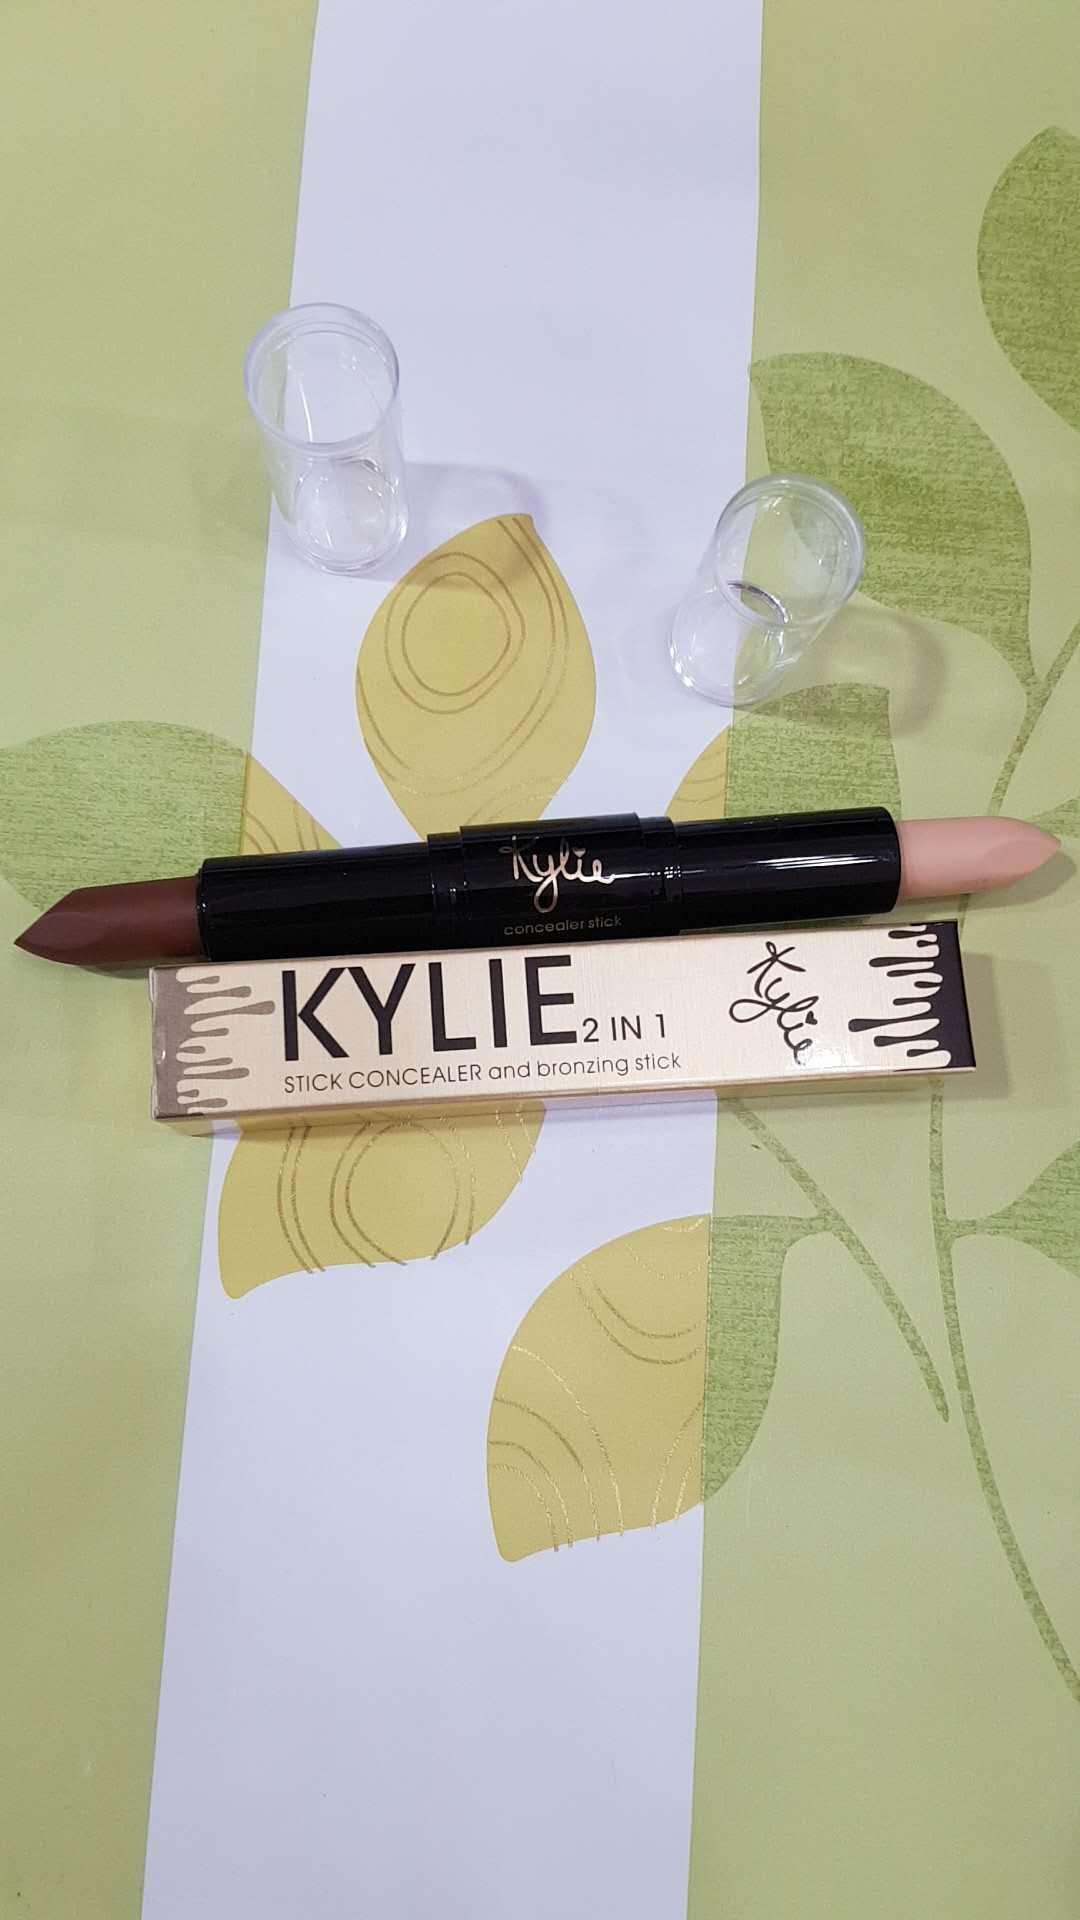 KYLIE- stick concealer and bronzing stick-03 Philippines